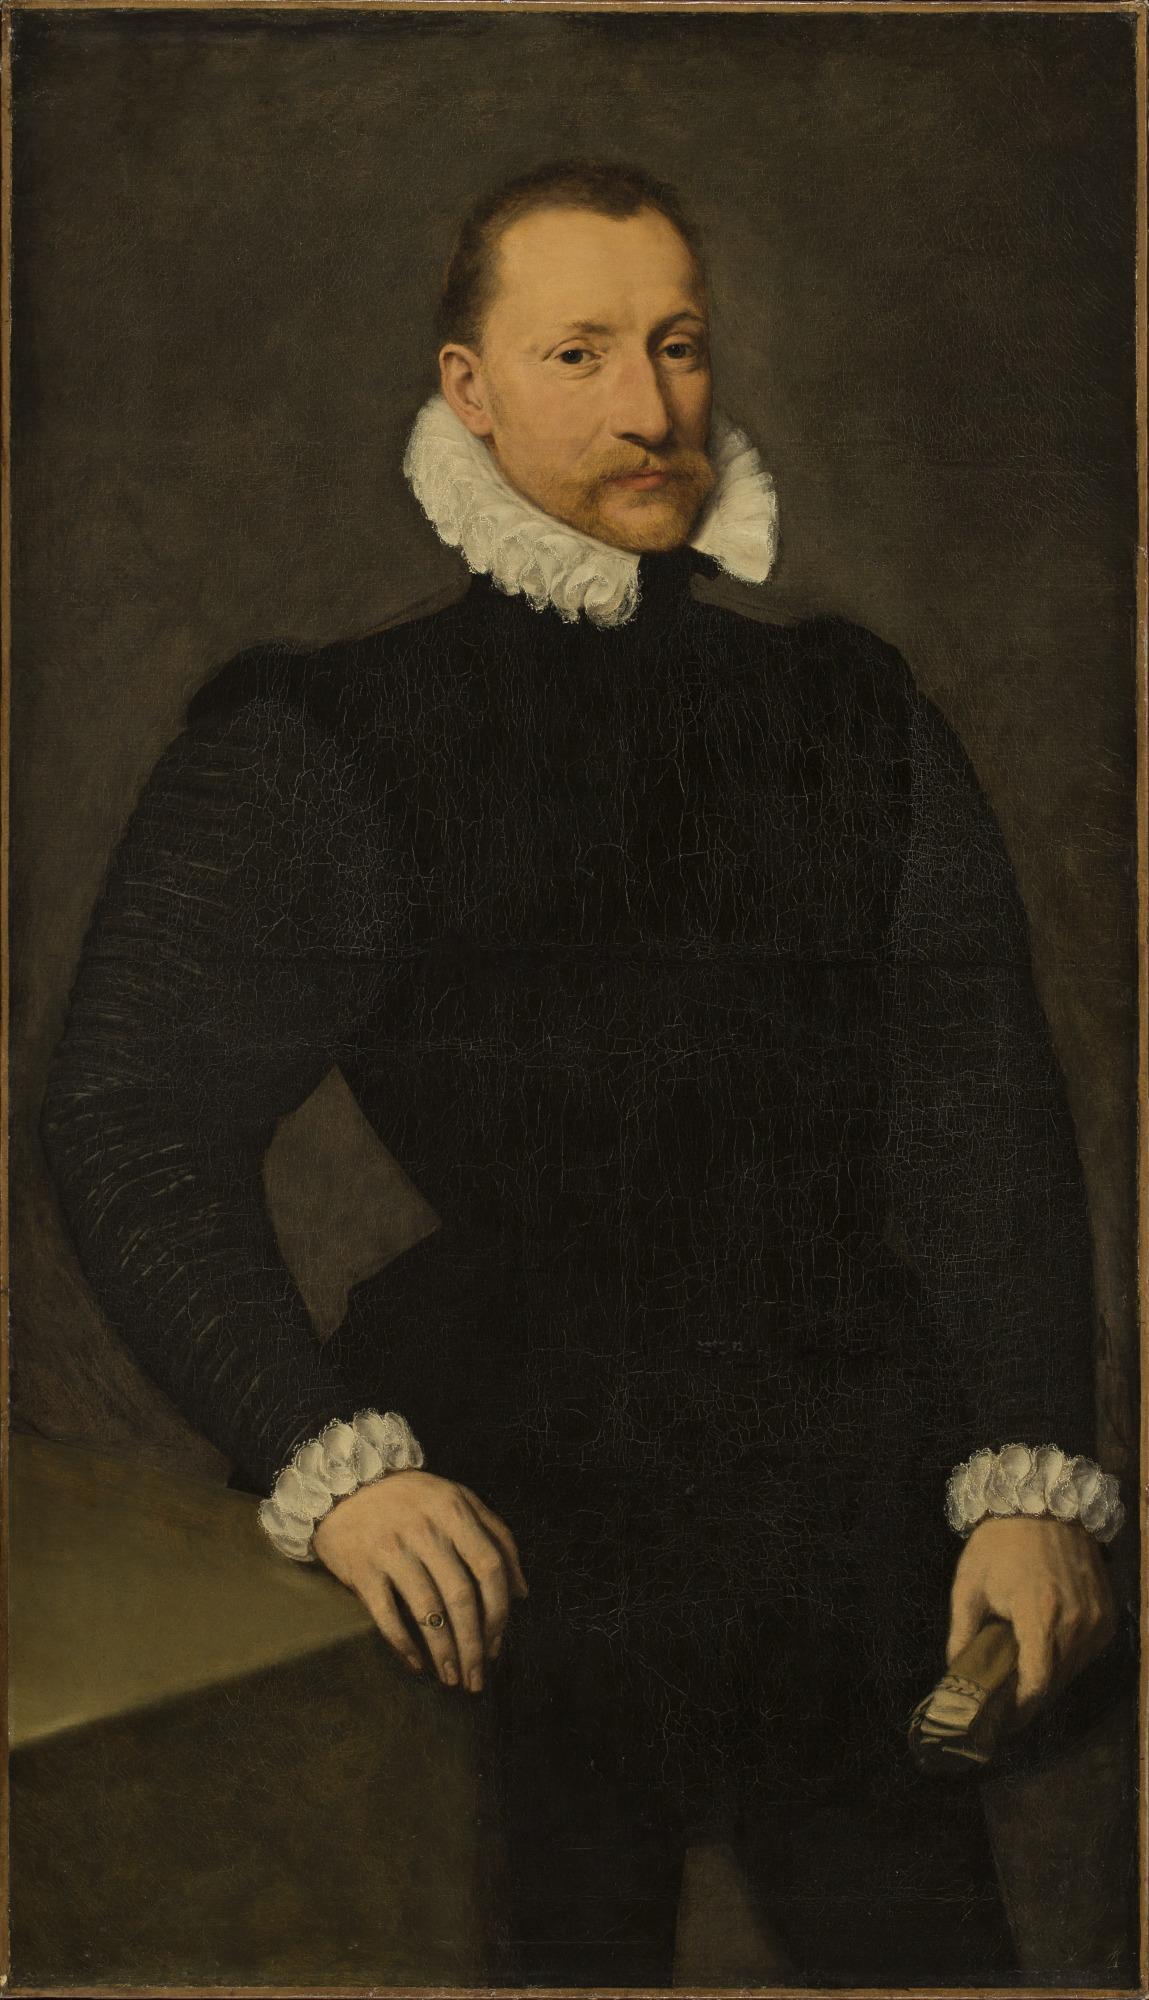 Magnus, Duke of Saxe-Weissenfels (Blooming Roses)